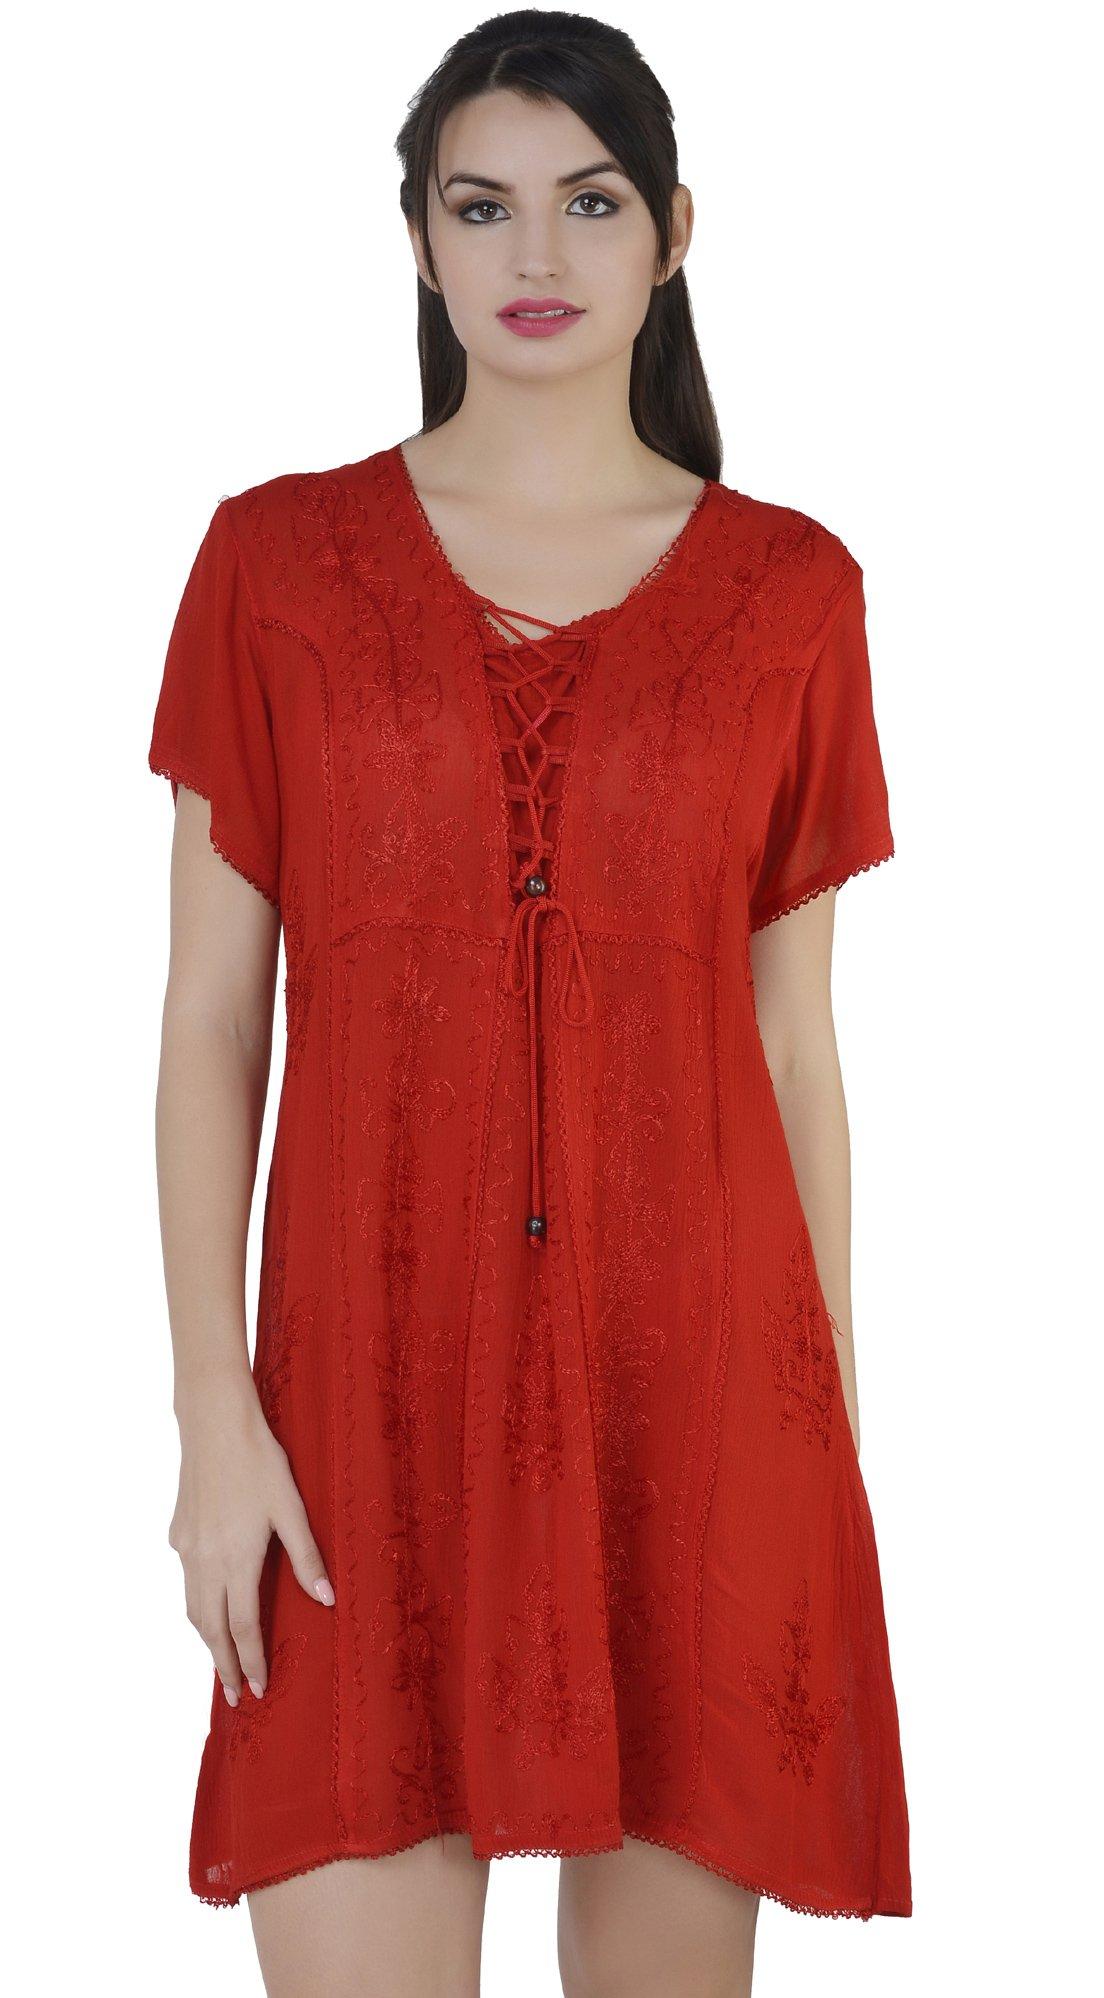 SKAVIJ Womens Shirt Casual Tops Short Sleeve T-Shirts Blouse Loose Tunic Dress